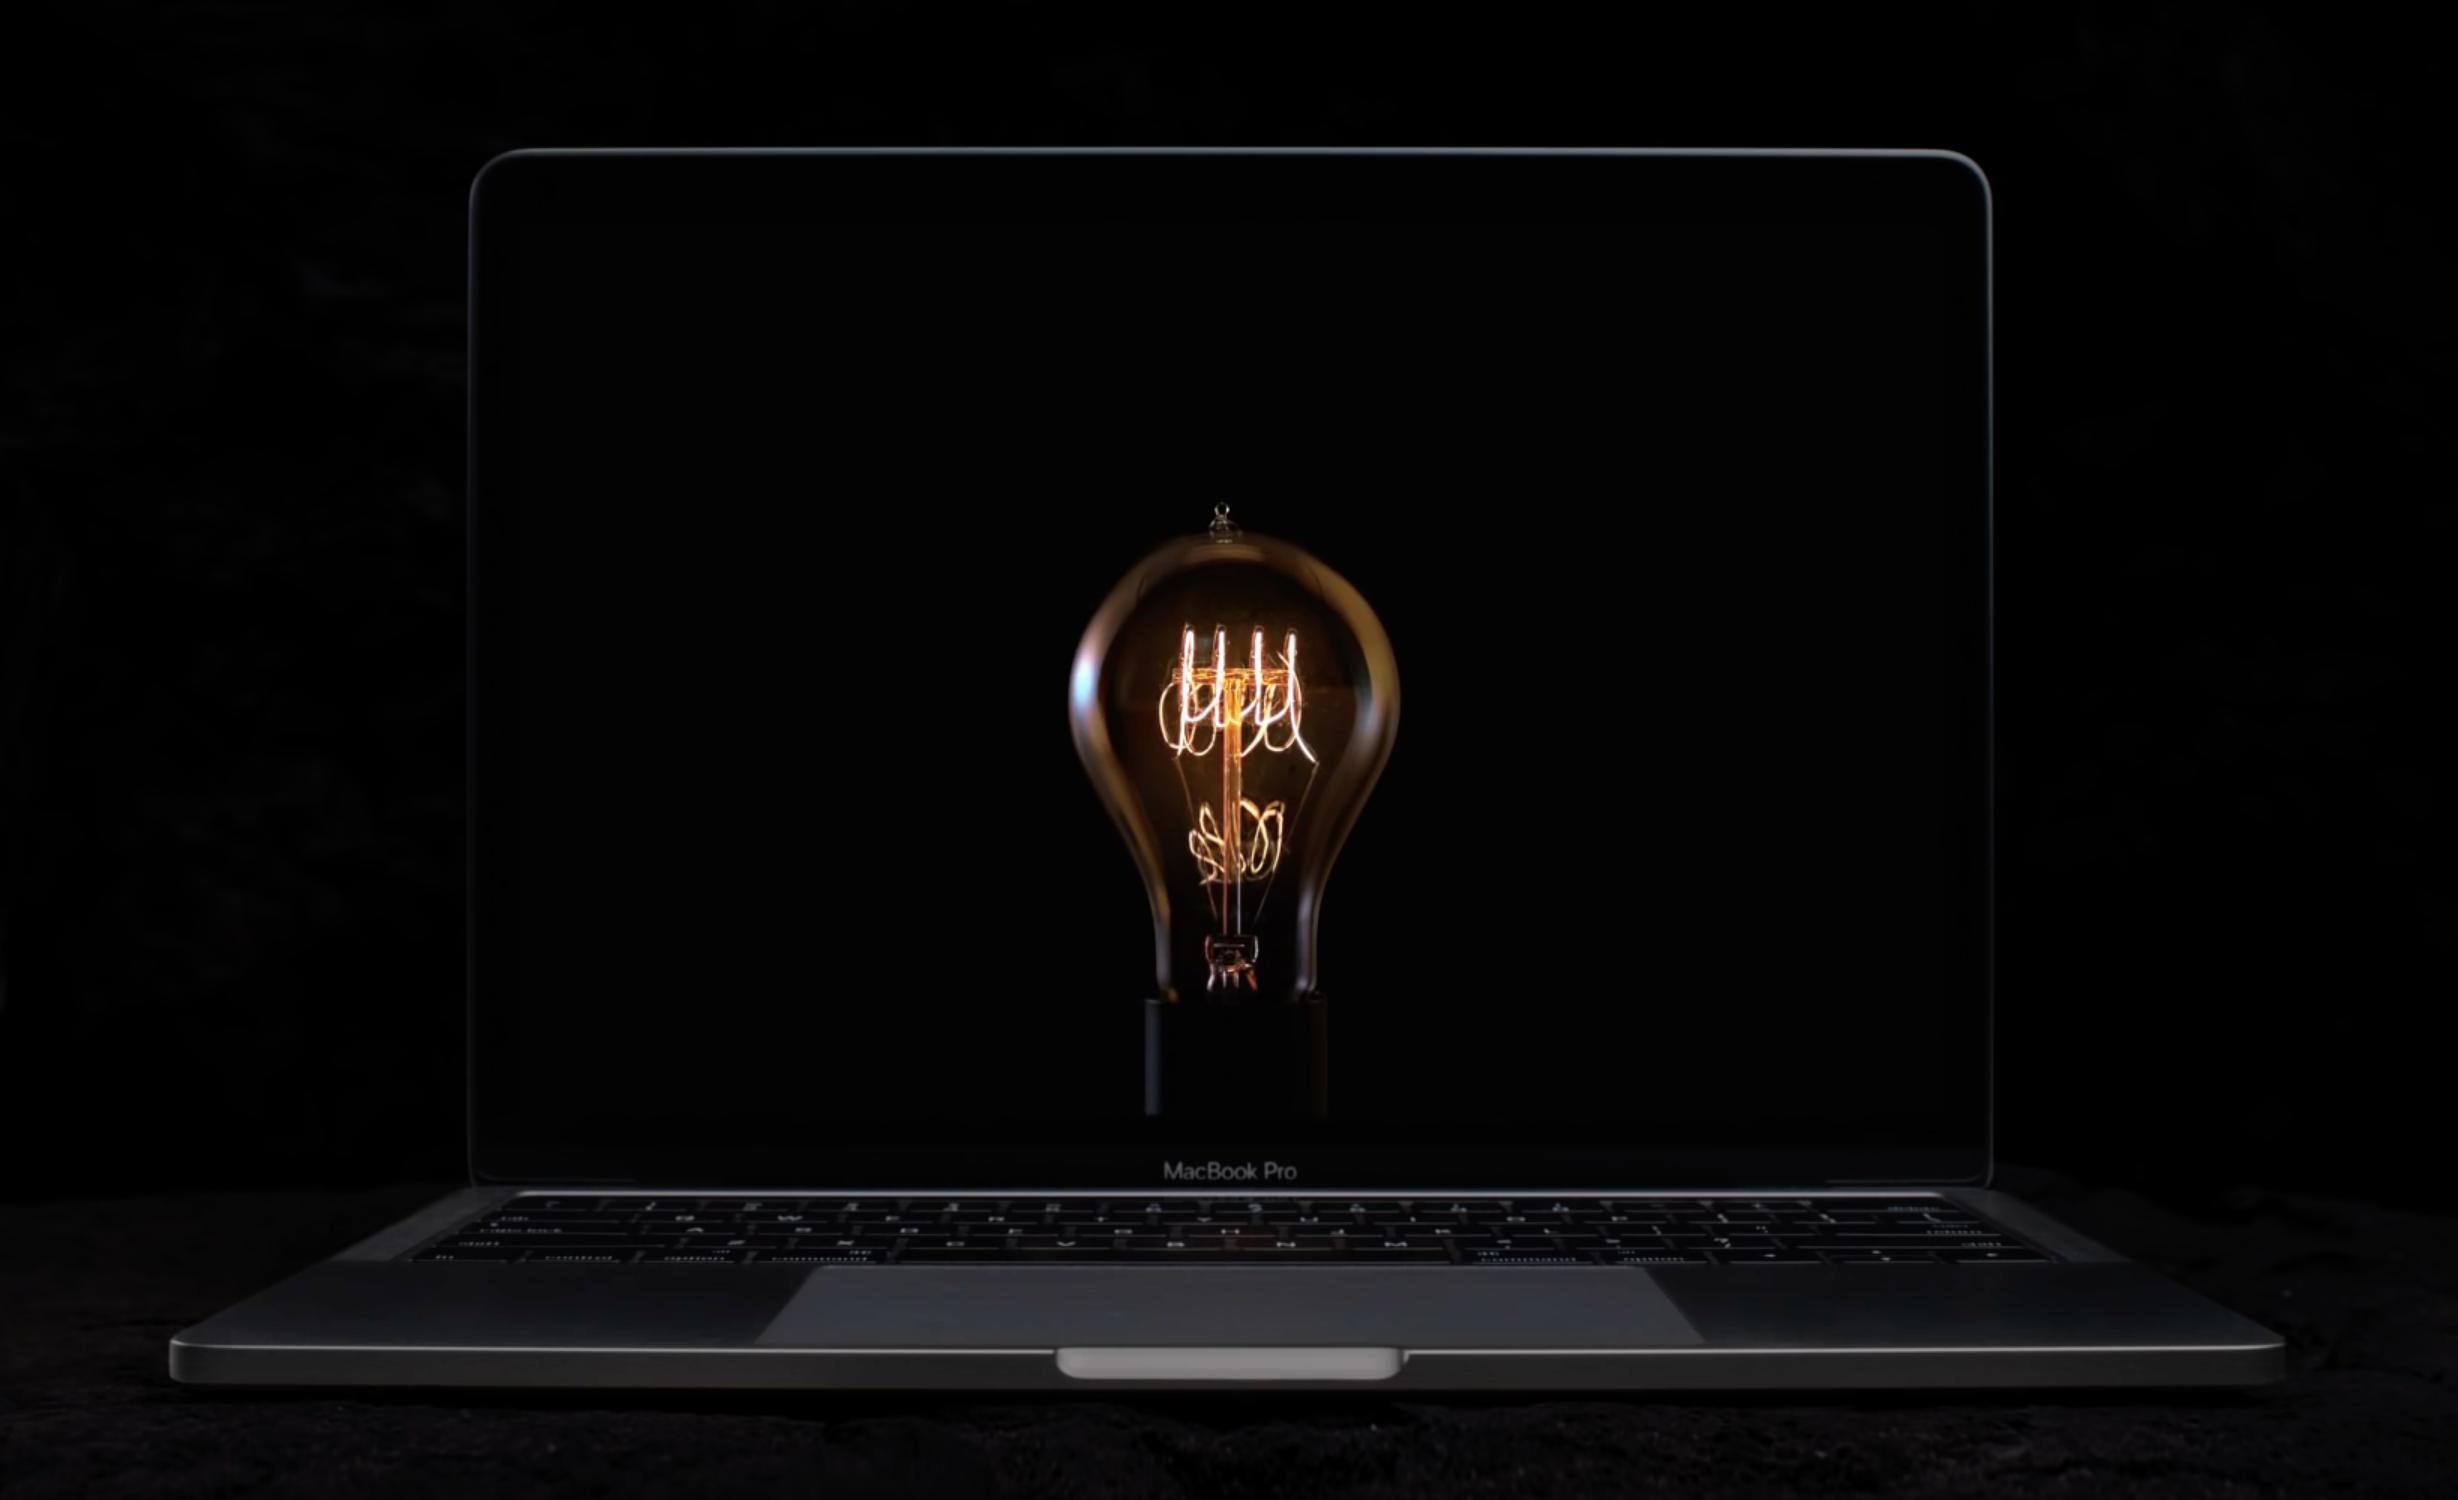 macbookpro_bulbs_apple_tvad